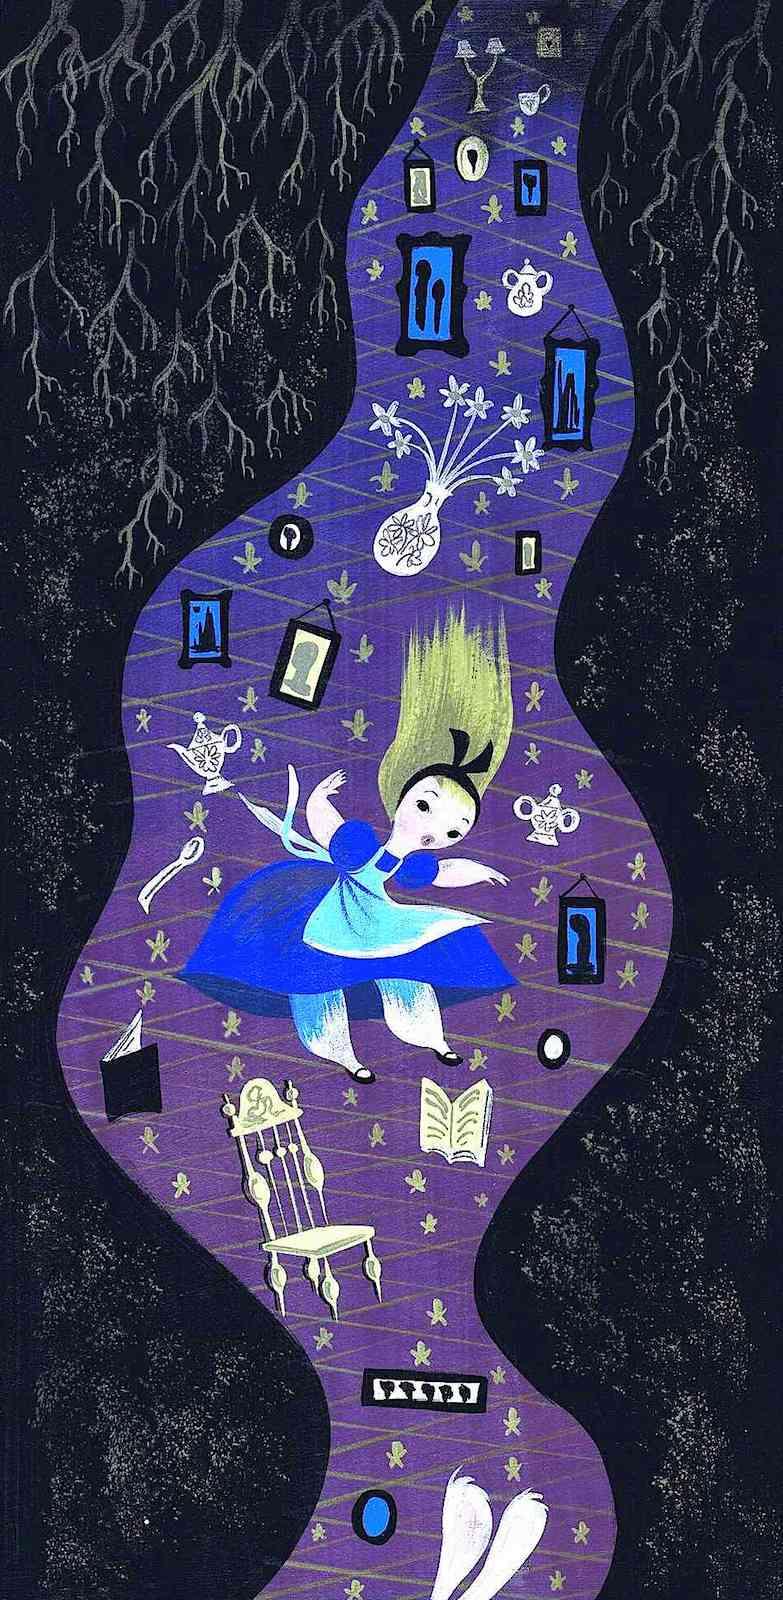 Mary Blair, Alice in Wonderland